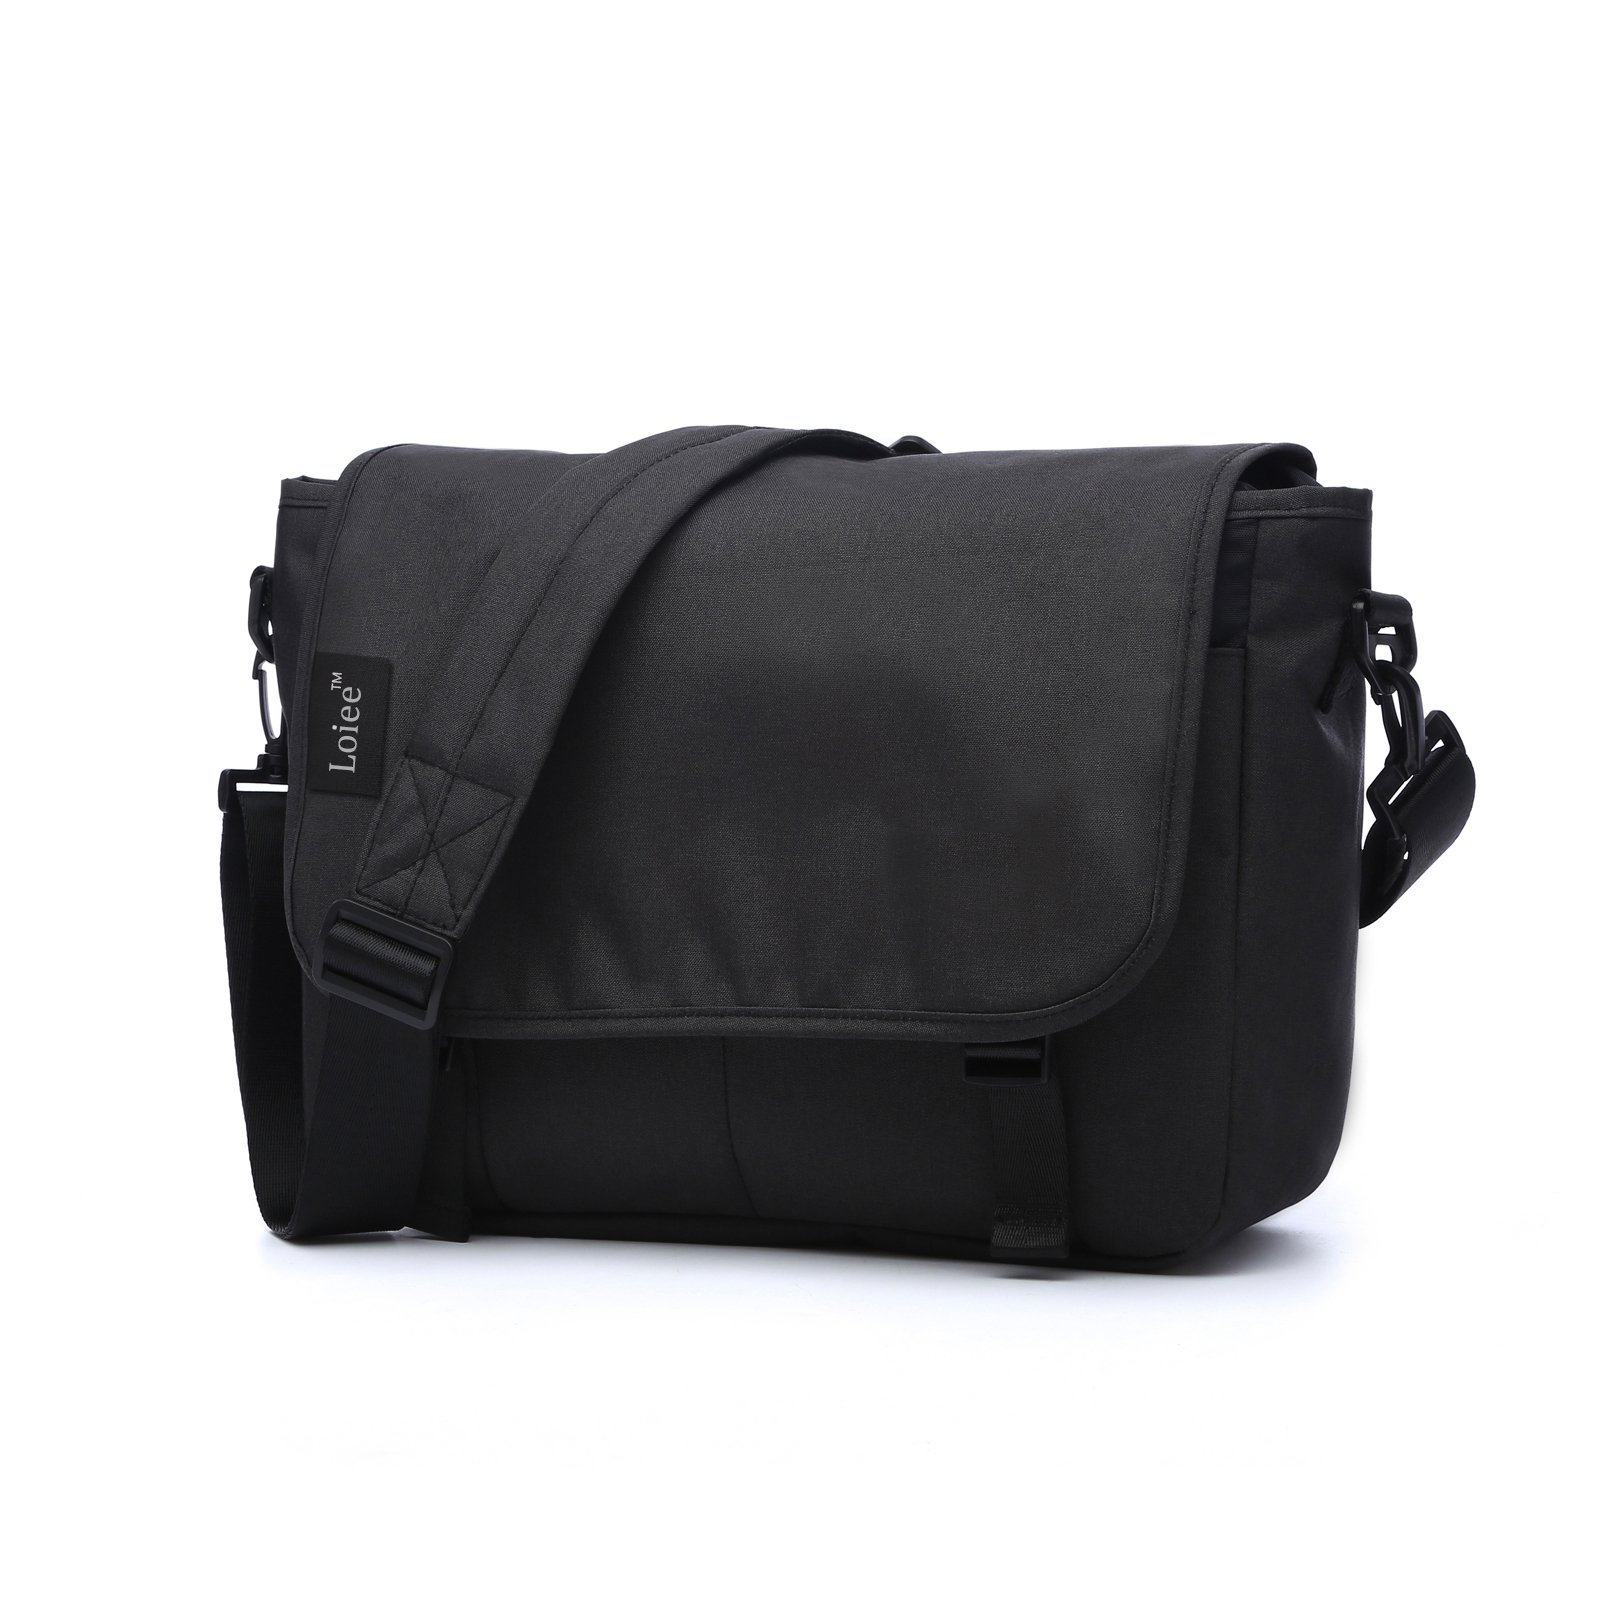 Loiee 14 inches Classic Canvas Messenger Bag,Water Resistant Vintage School Bag,Black